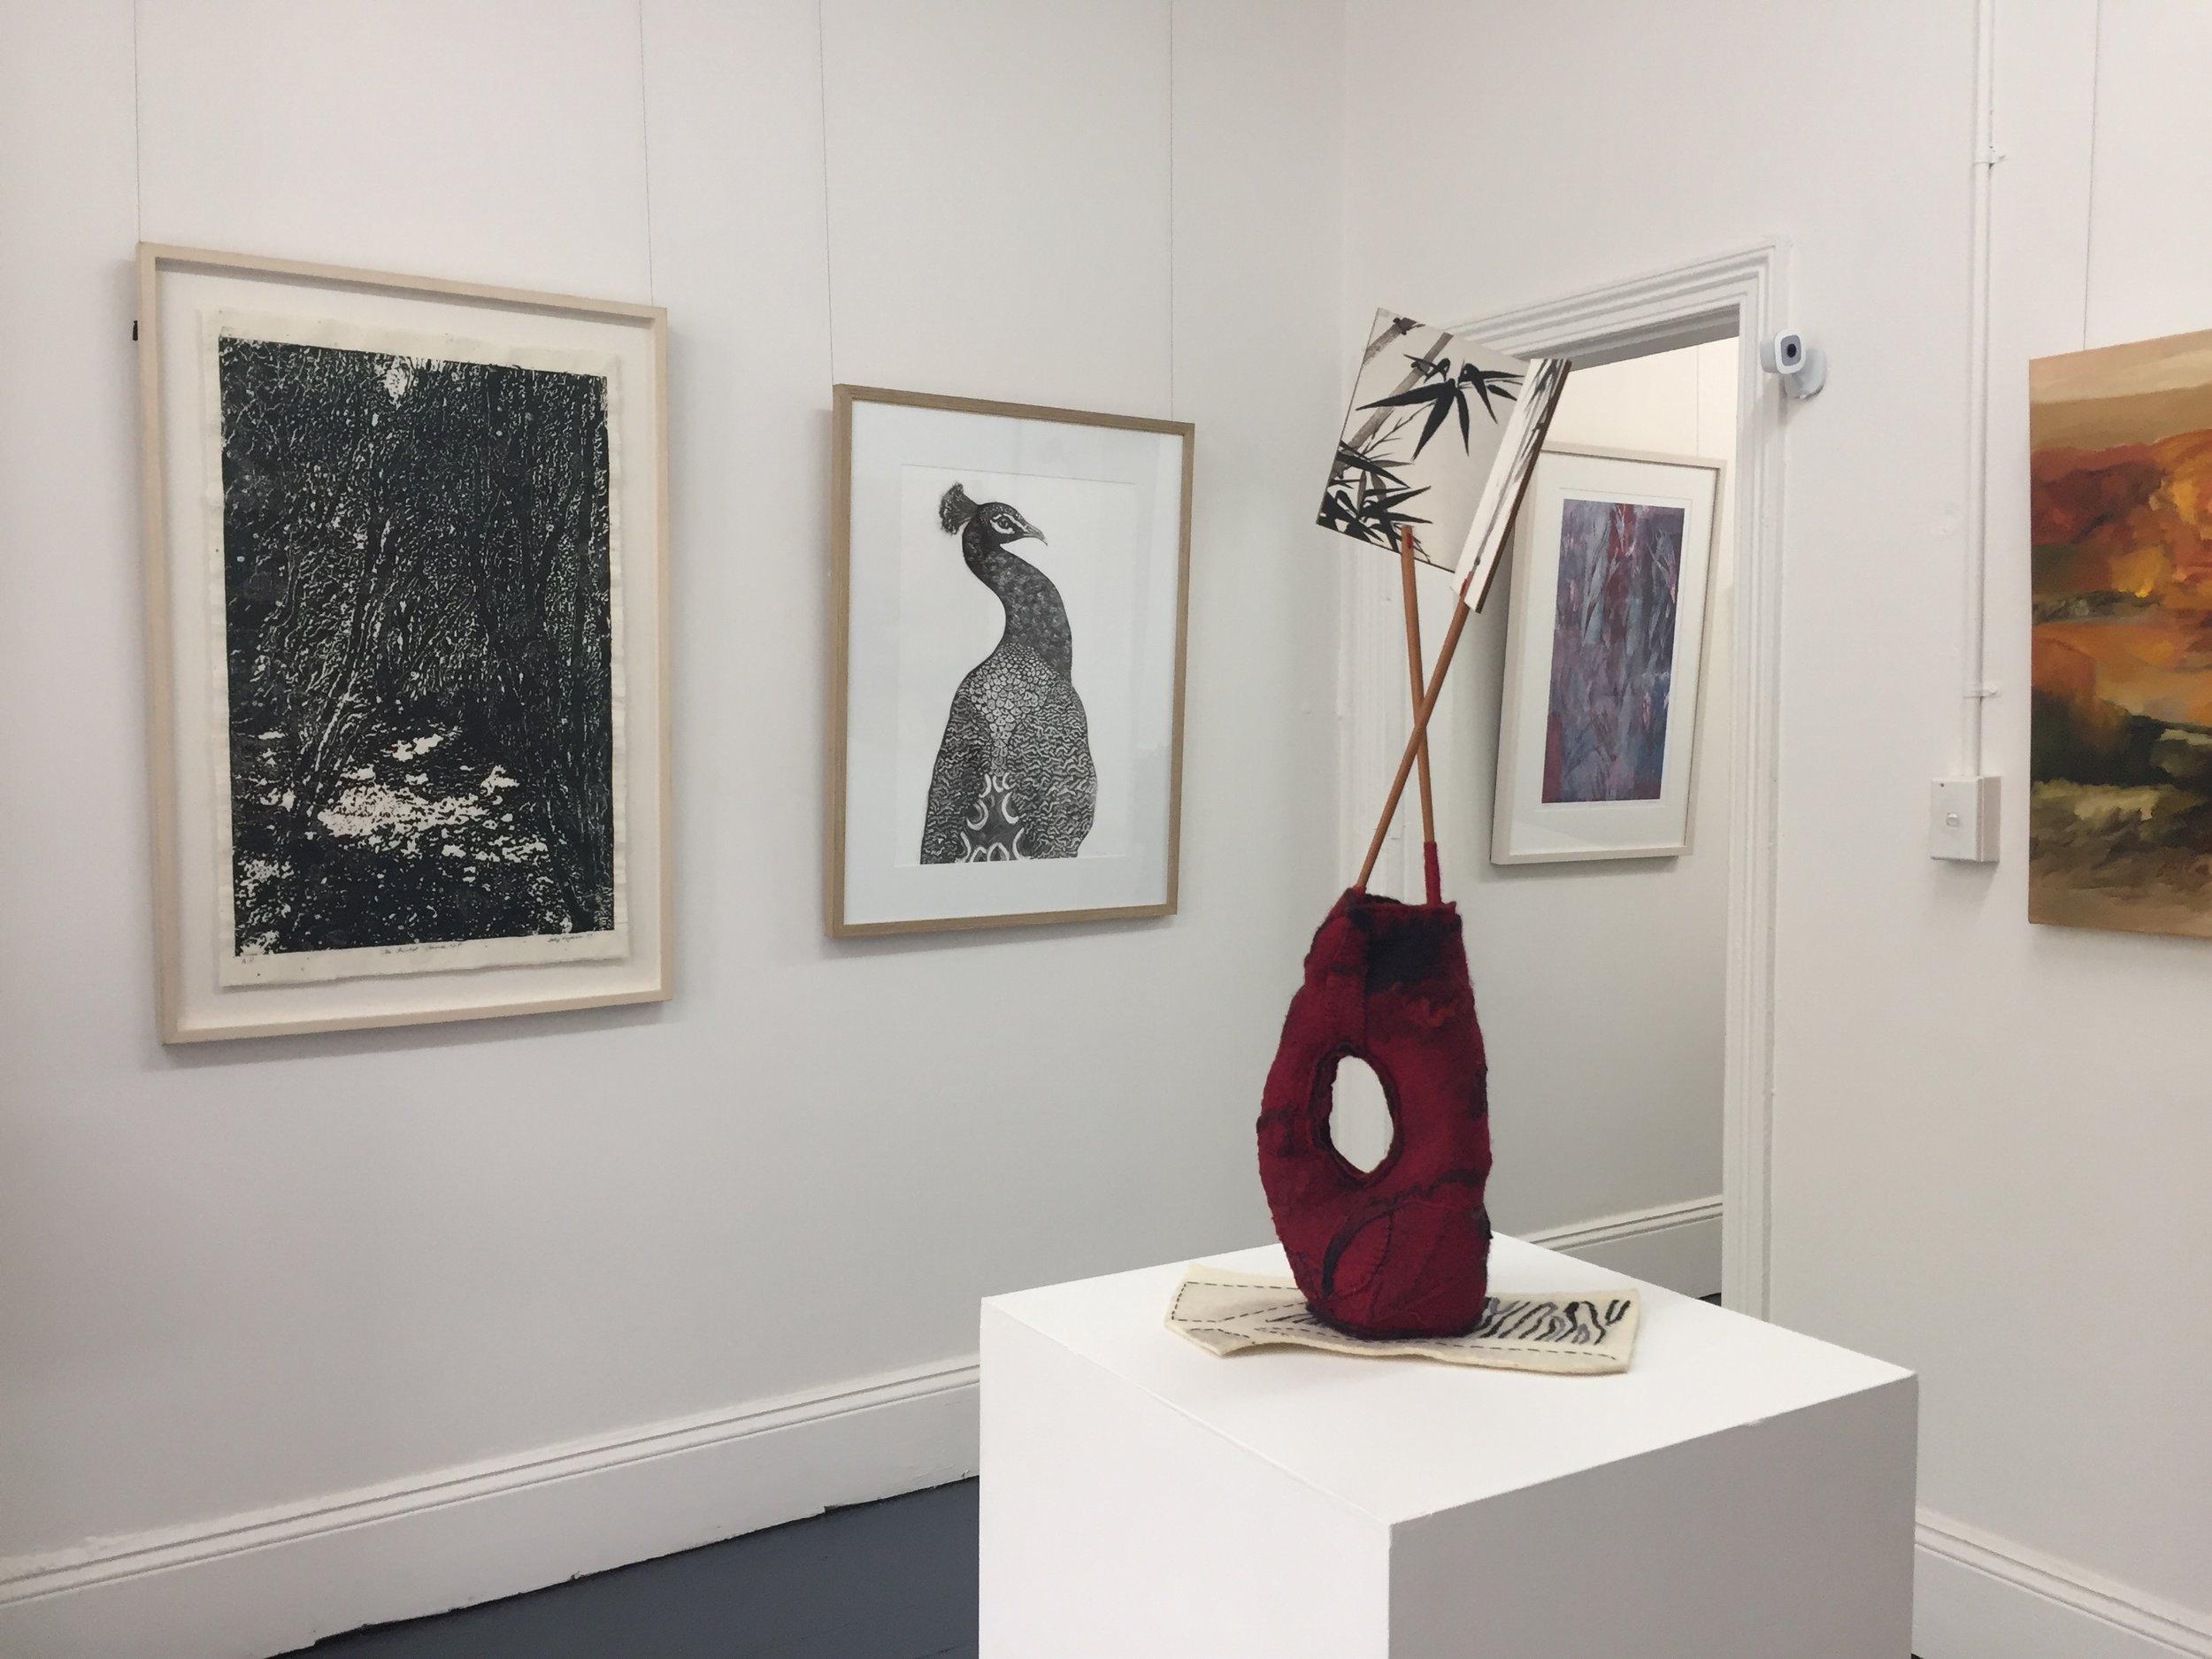 install view printmaking by Sally Reynolds,Terri Brander, Helene Leane, painting by Lydia Miller, sculpture by Giselle Penn